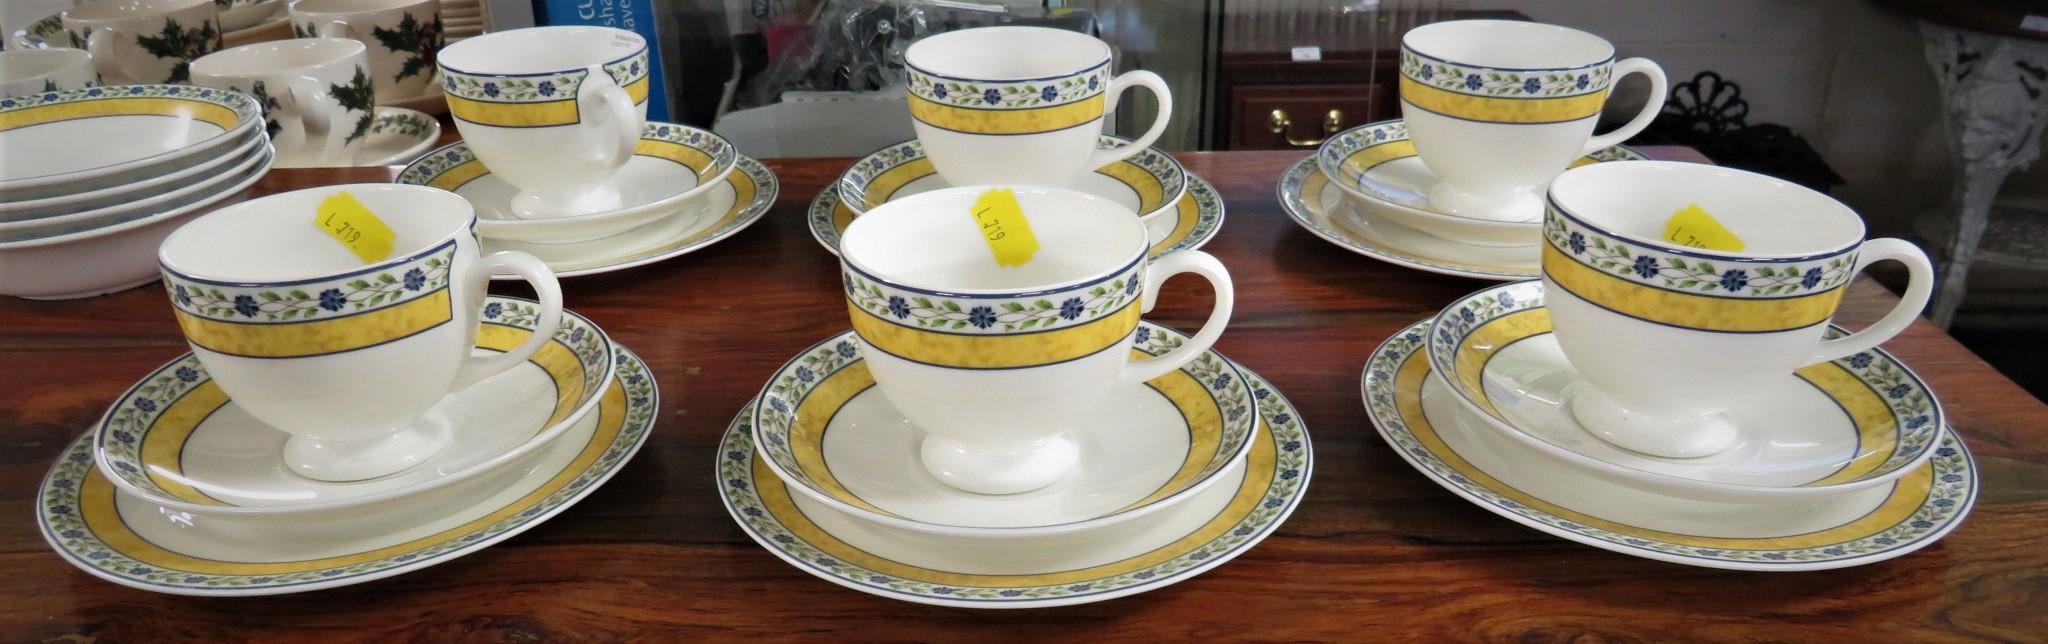 Lot 63 - WEDGWOOD MISTRAL TEA SET - SIX CUPS AND SAUCERS, SIX PLATES, FOUR BOWLS AND A MILK JUG